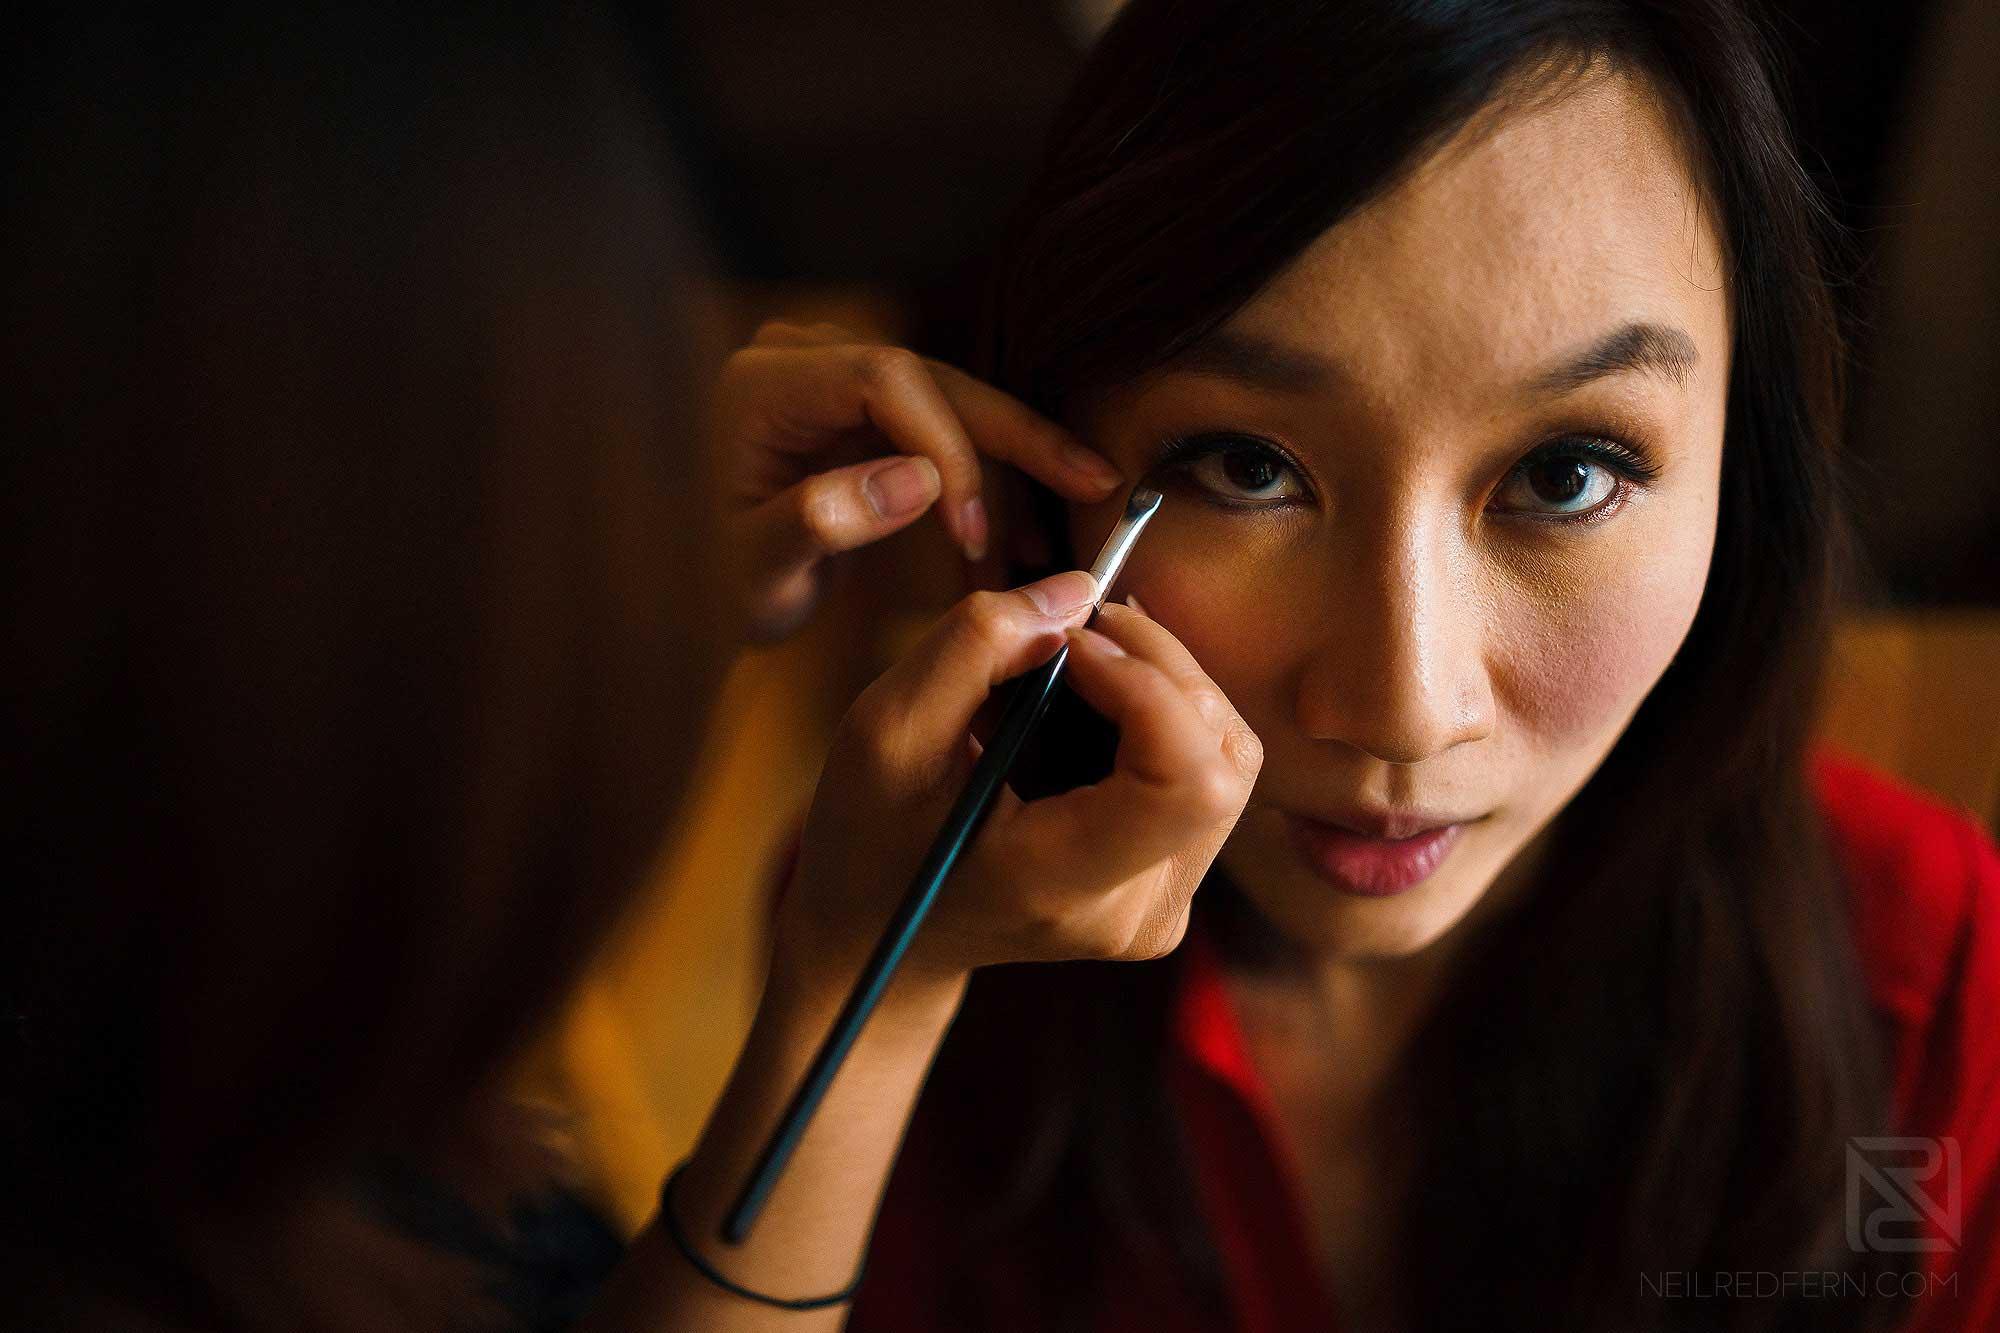 chinese bride having make-up put on